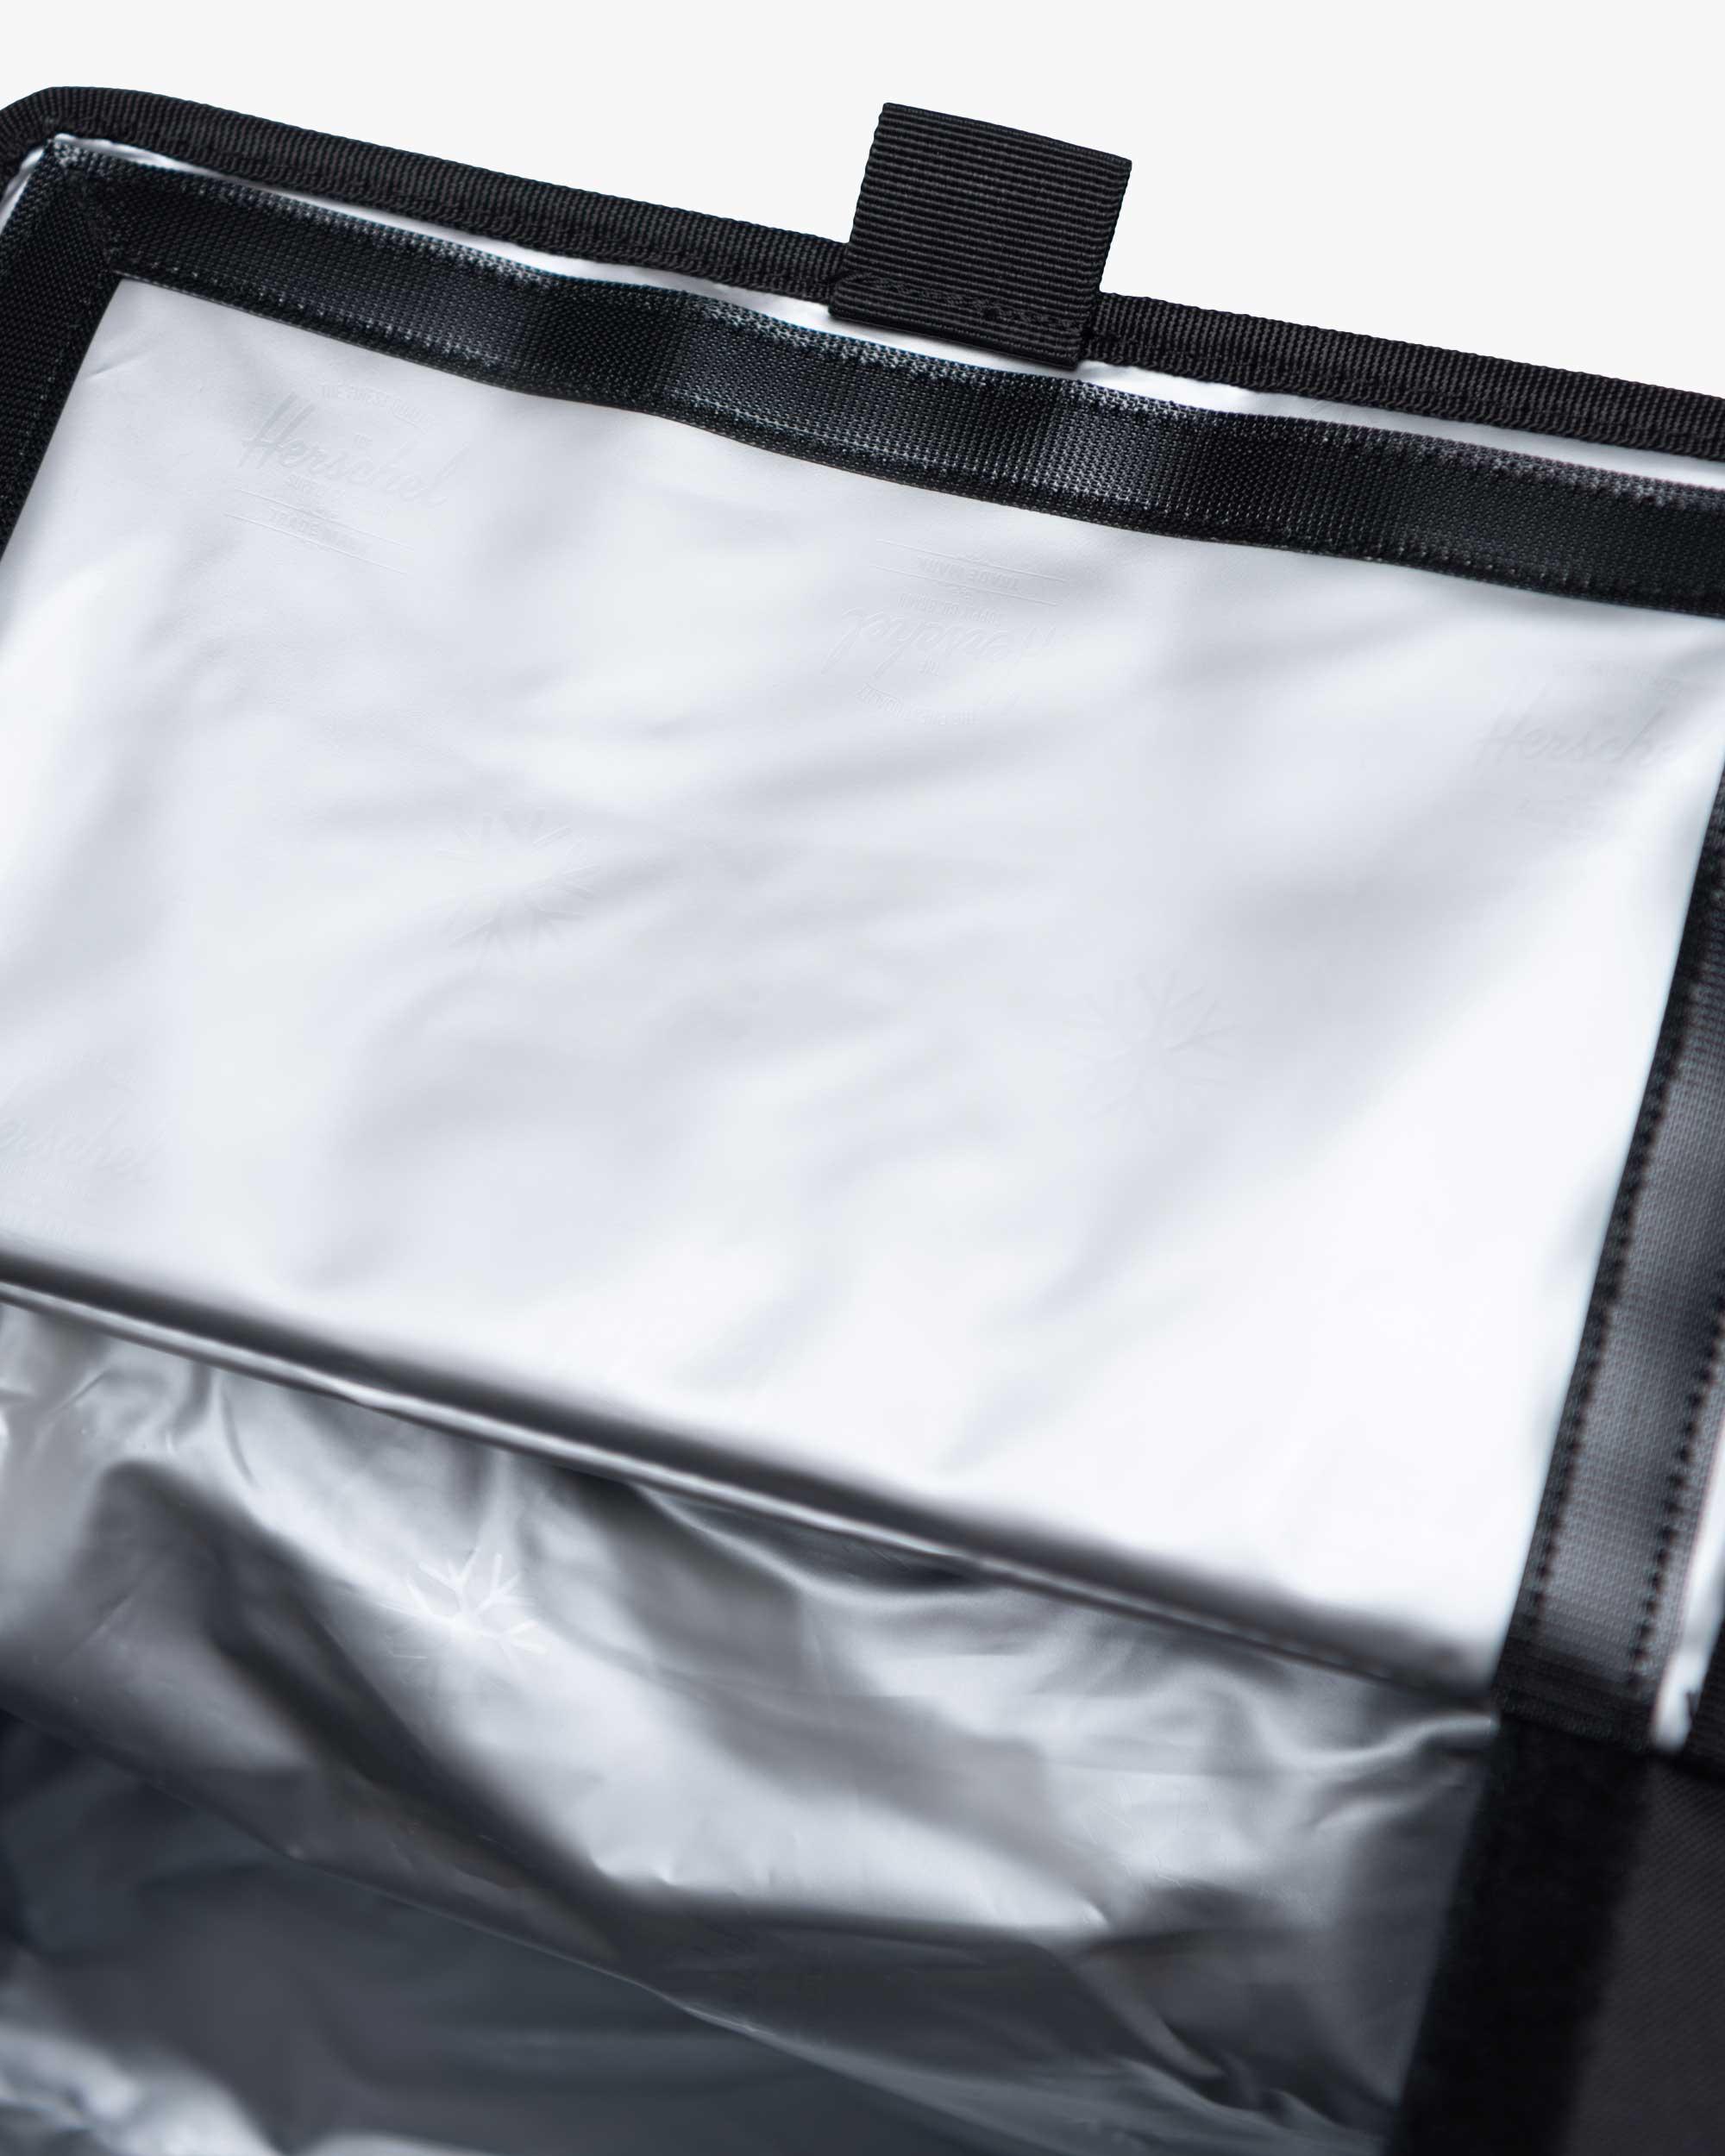 Leakproof liner